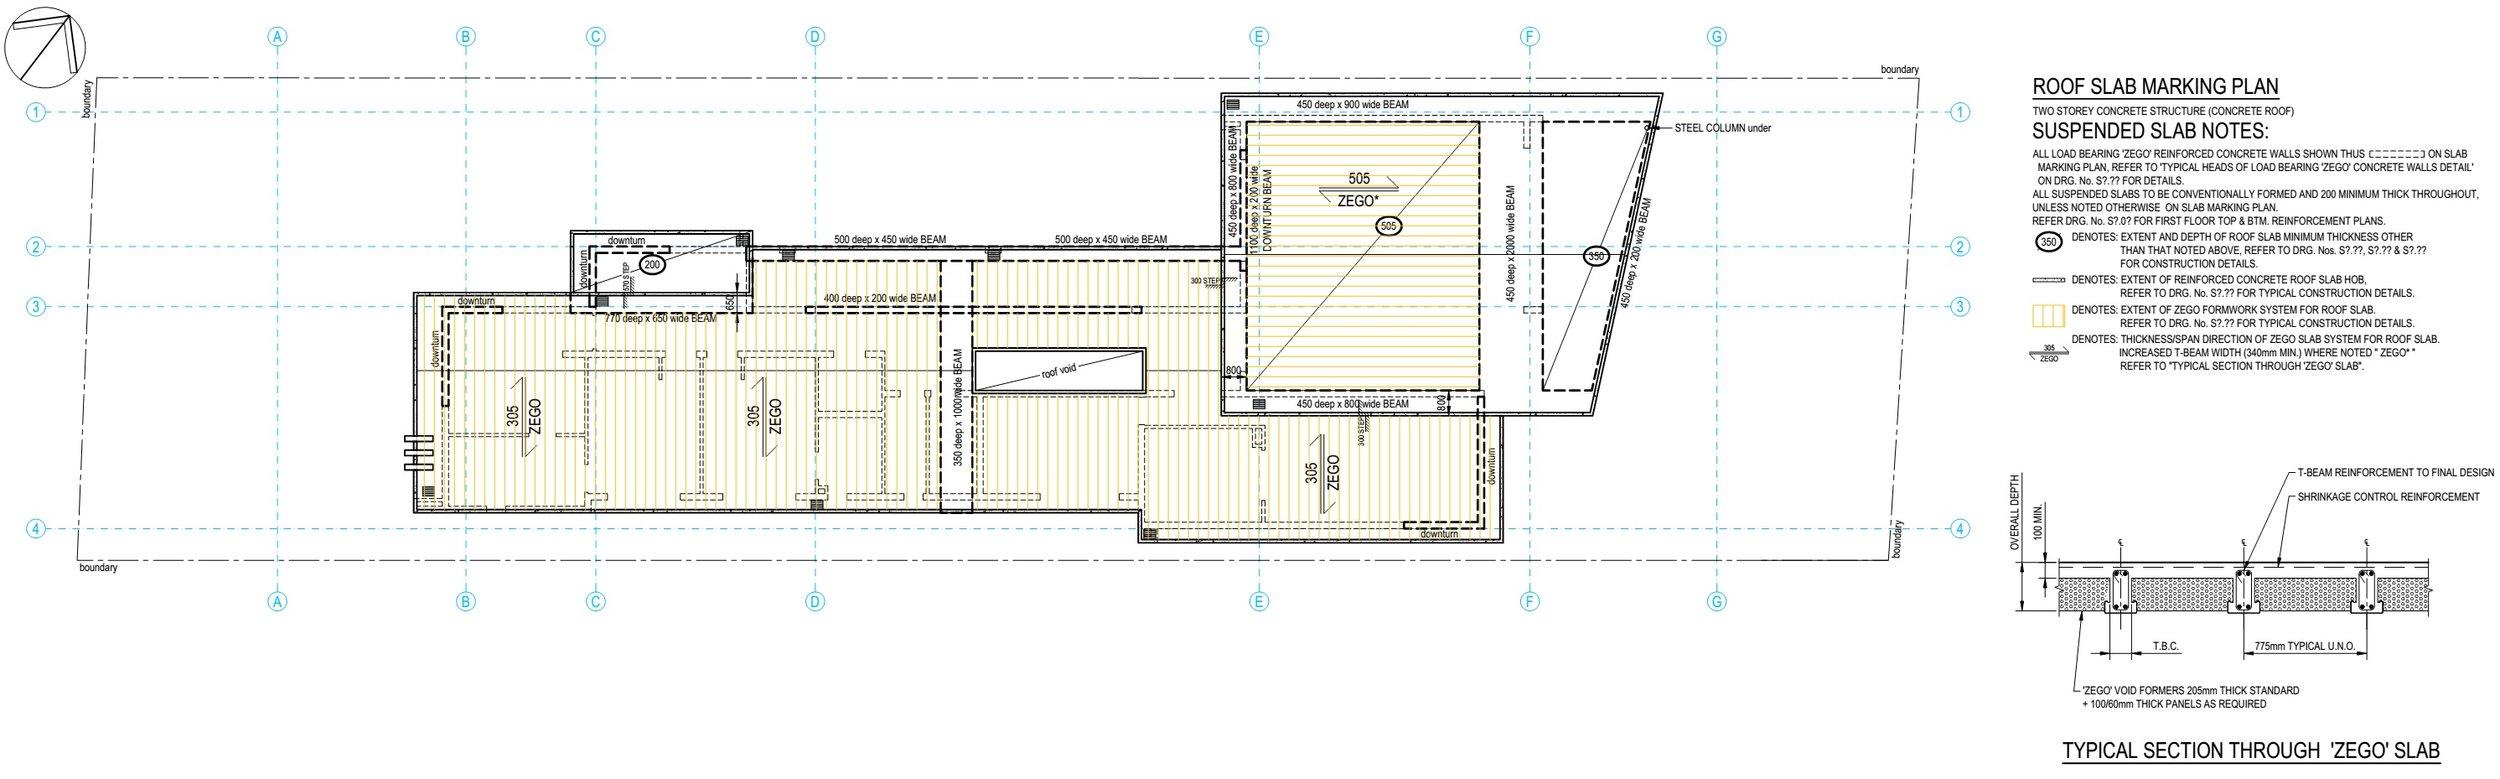 AUS02-17097 - roof slab plan.jpg